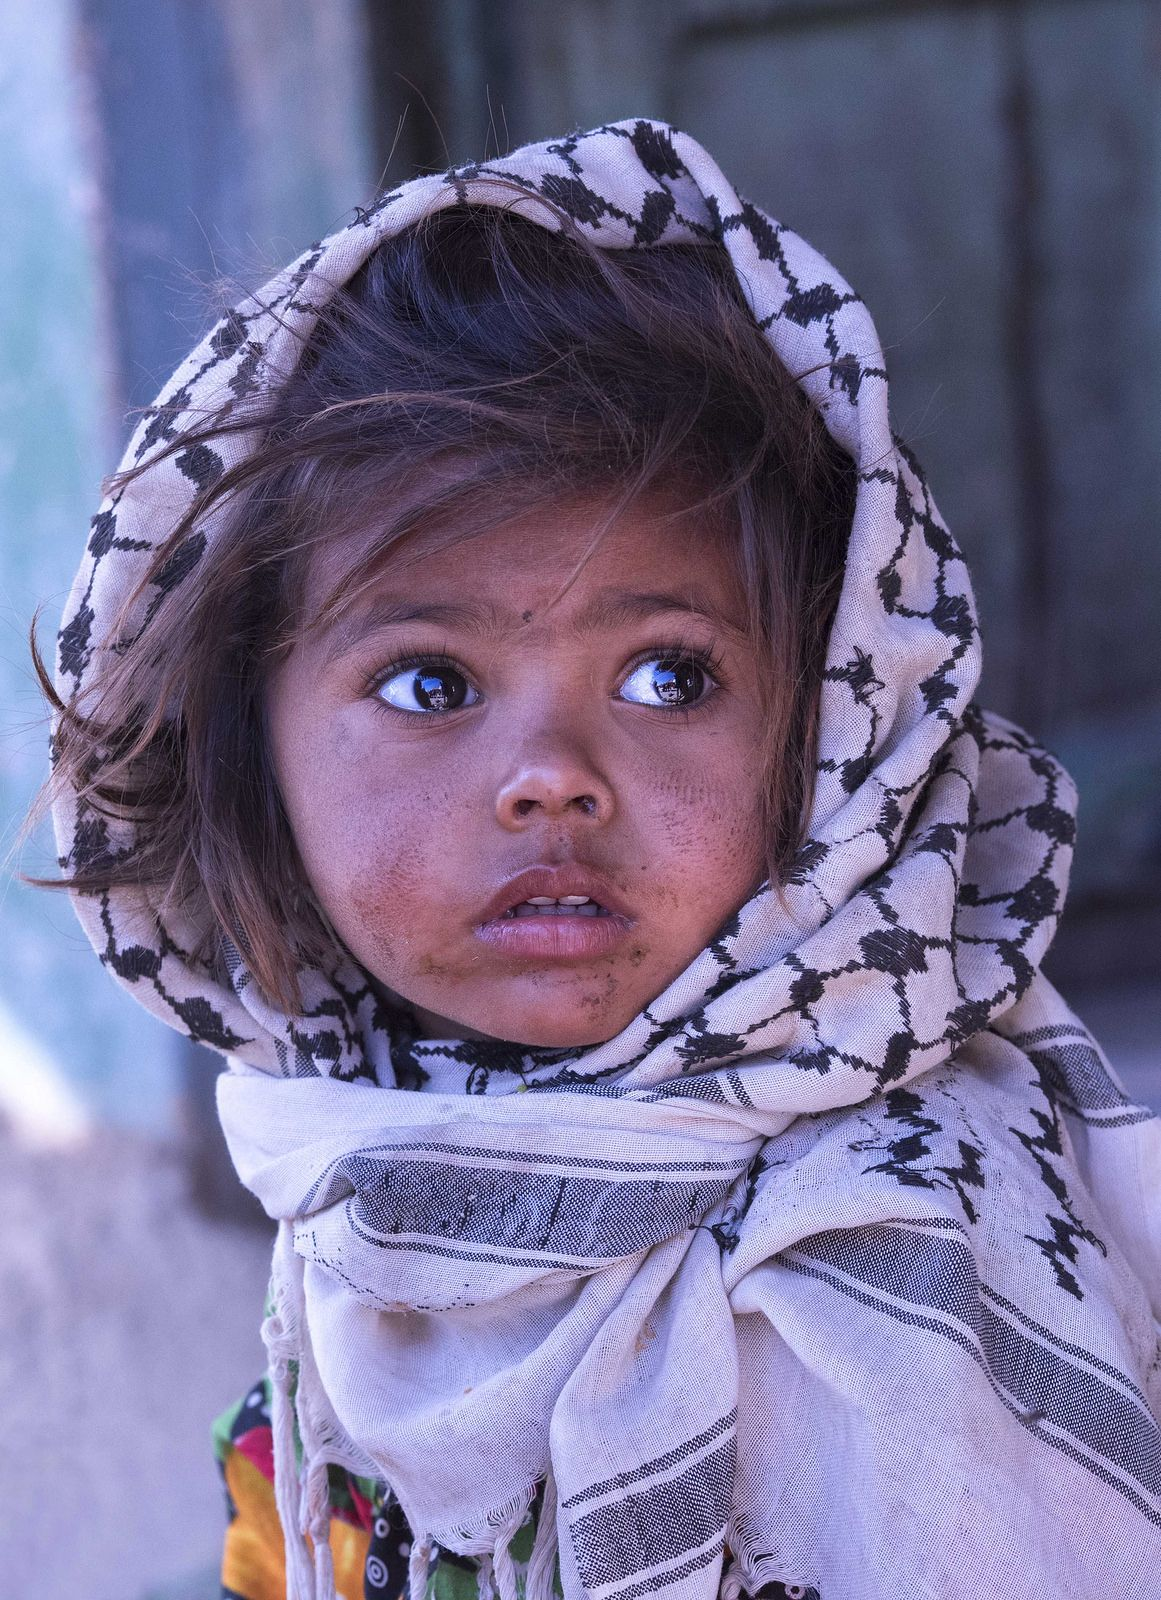 Precious little one . Gujarat